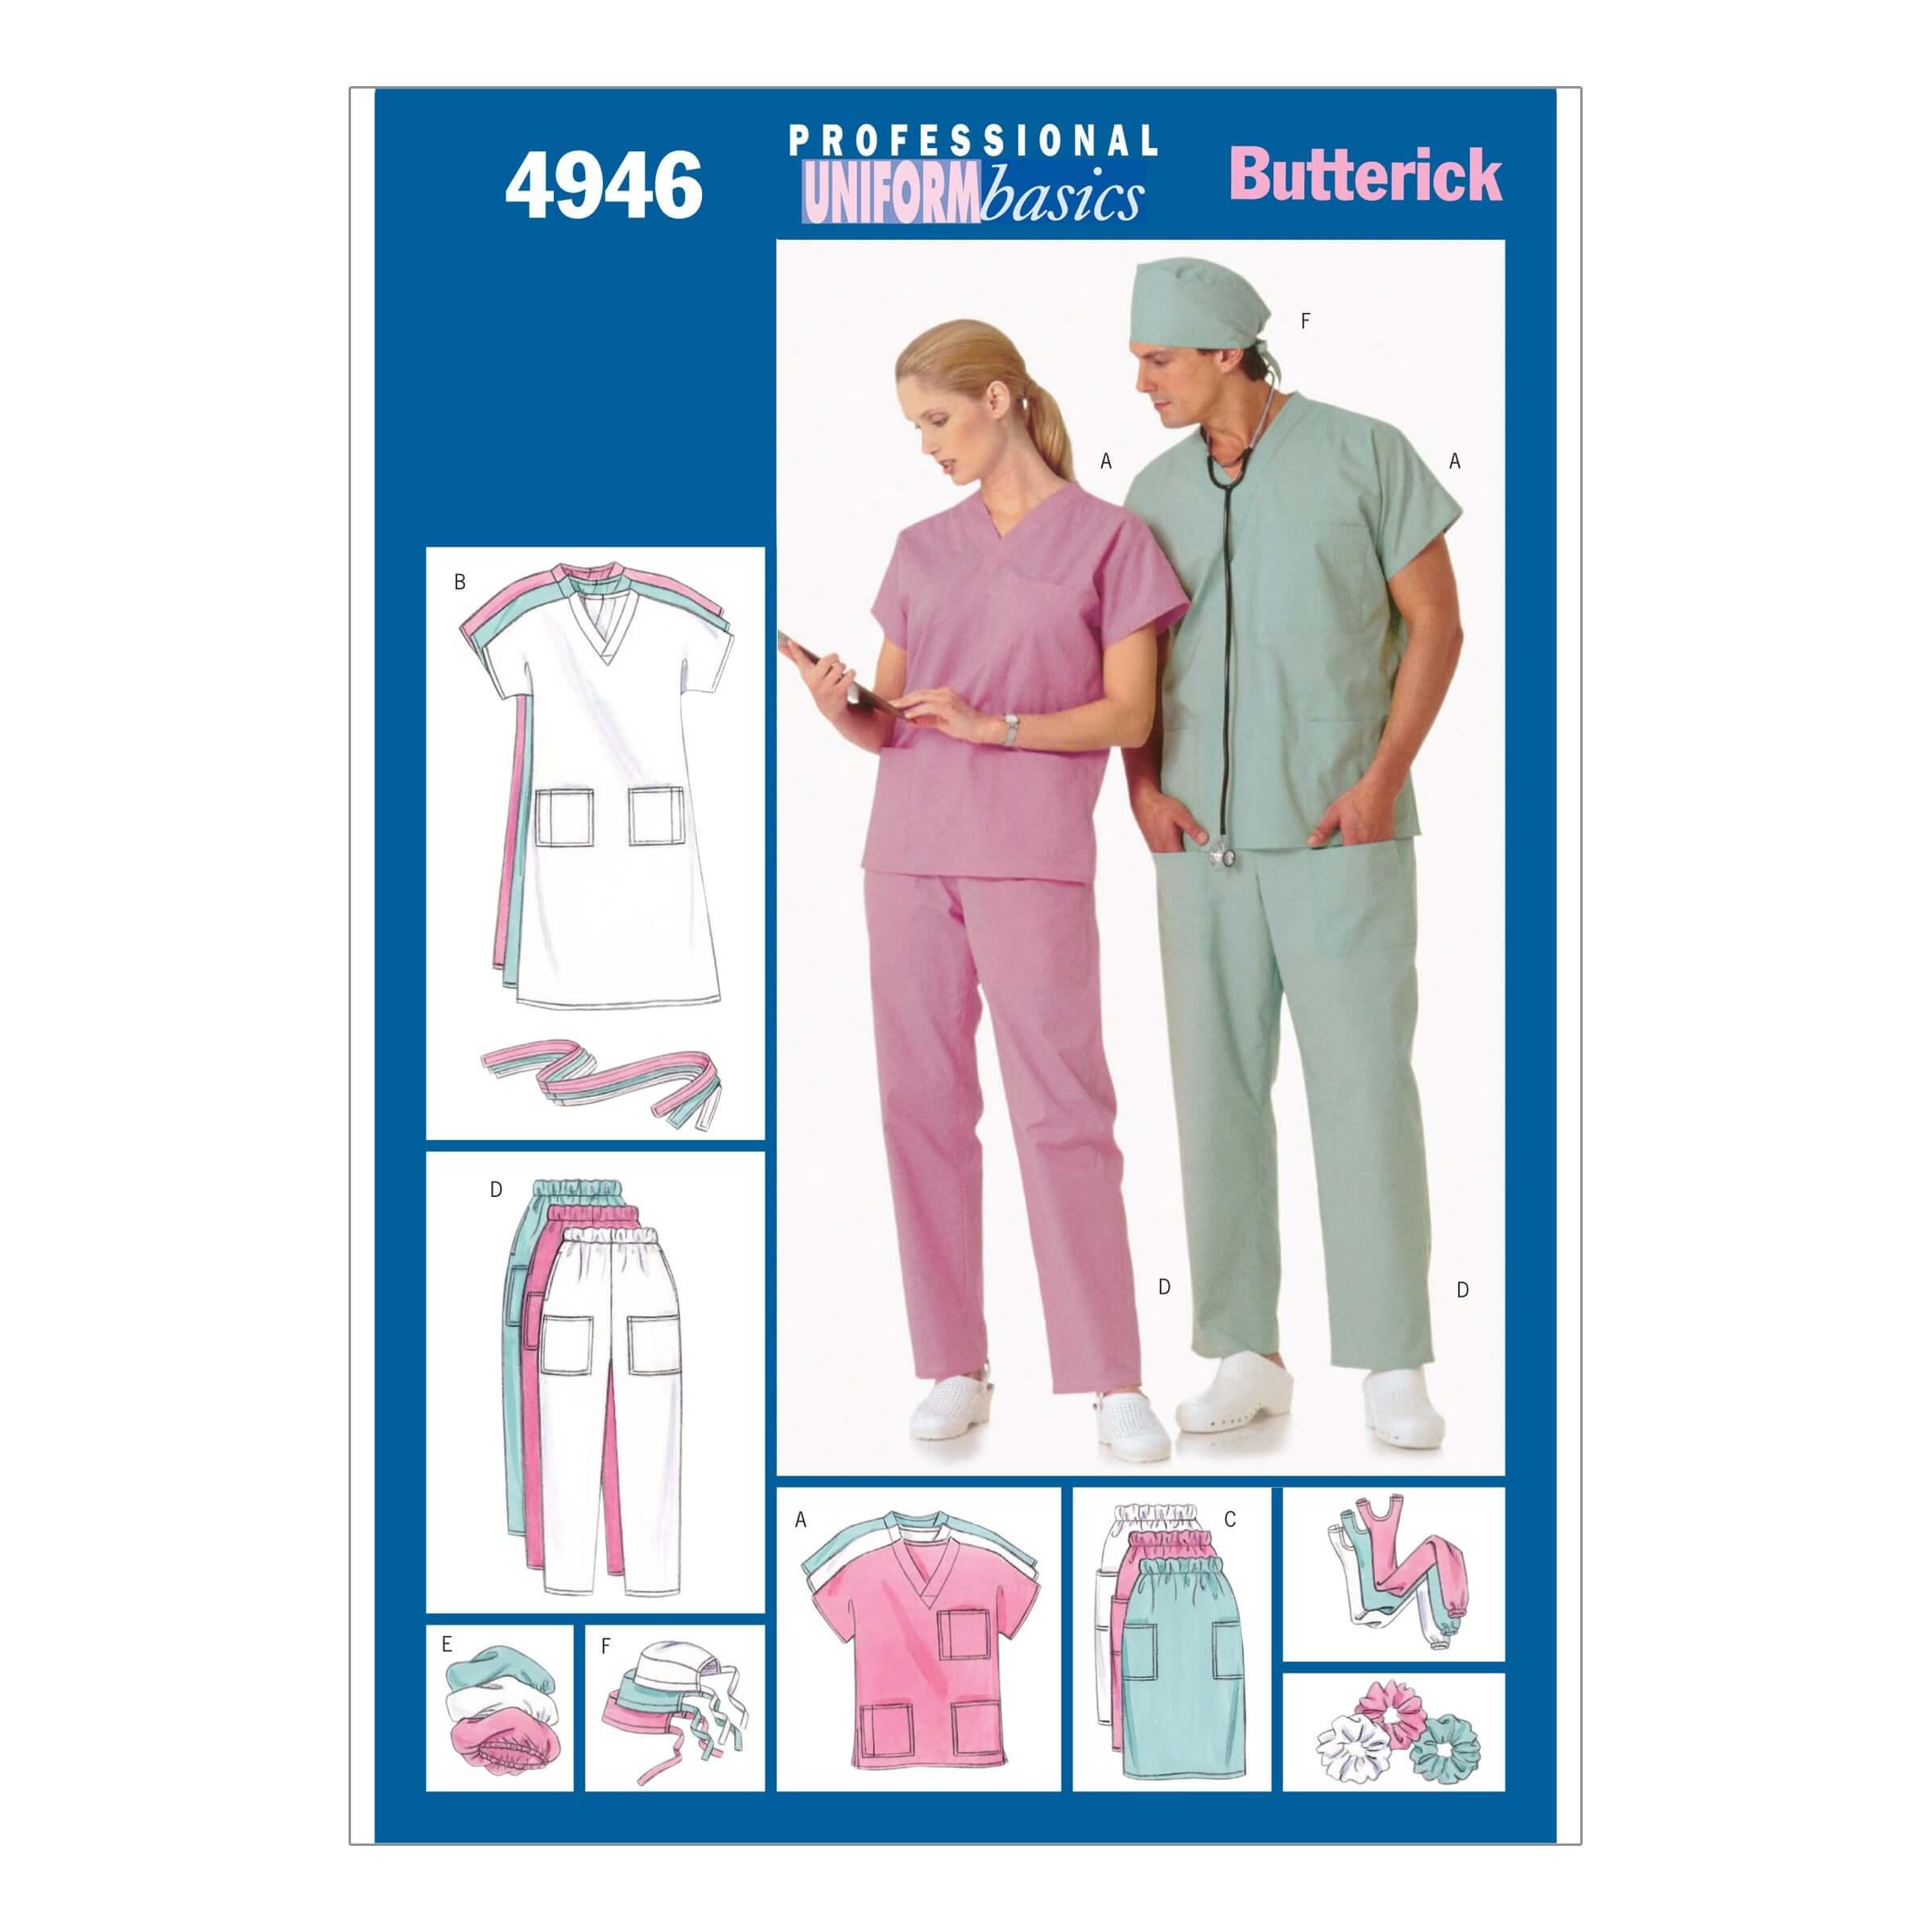 Butterick Sewing Pattern 4946 Unisex Nurse Uniforms Dress Top Skirt Trousers